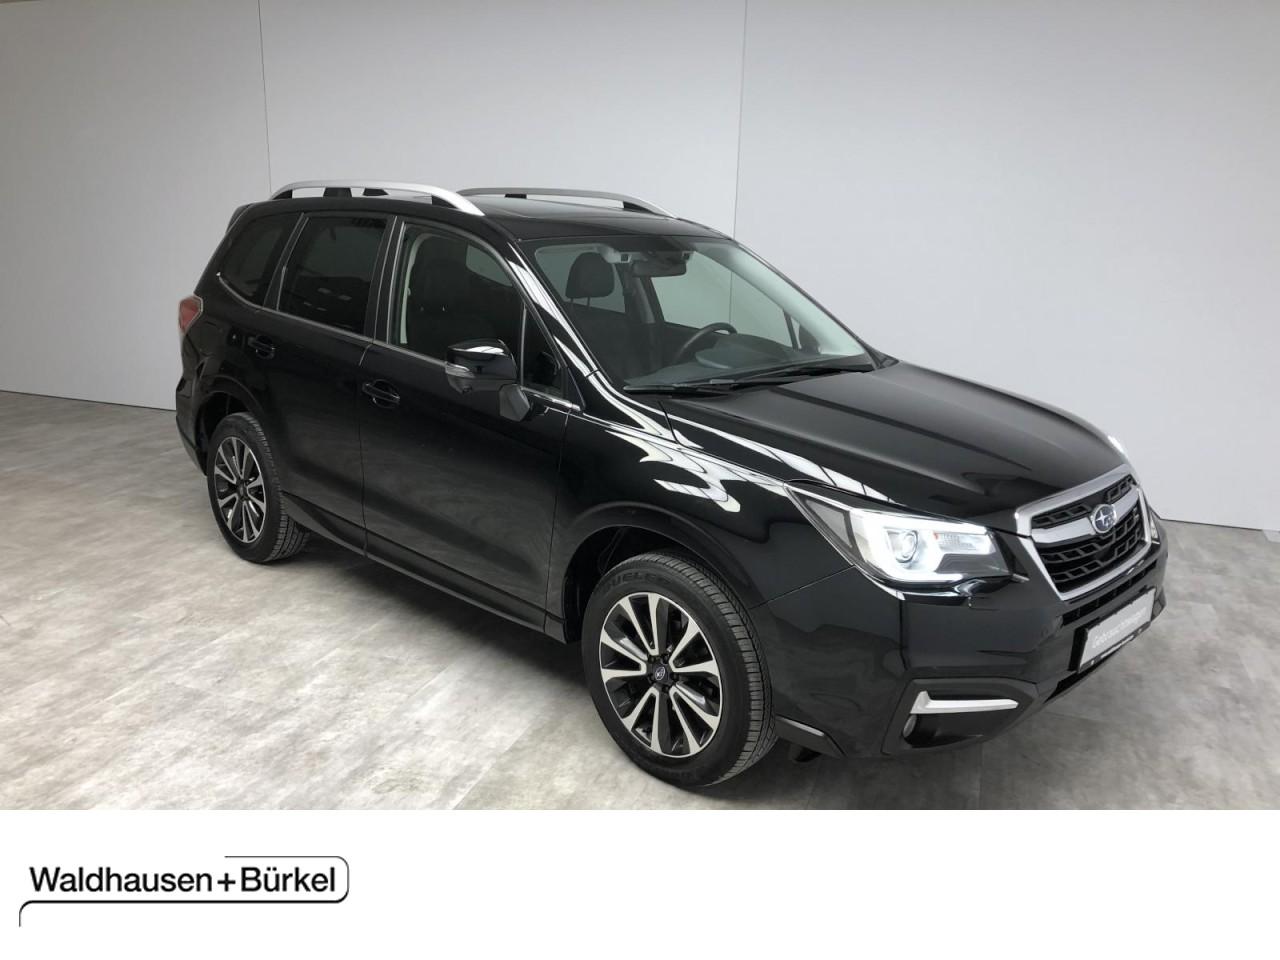 Subaru Forester 2.0i Platinum Navi Leder, Jahr 2017, Benzin